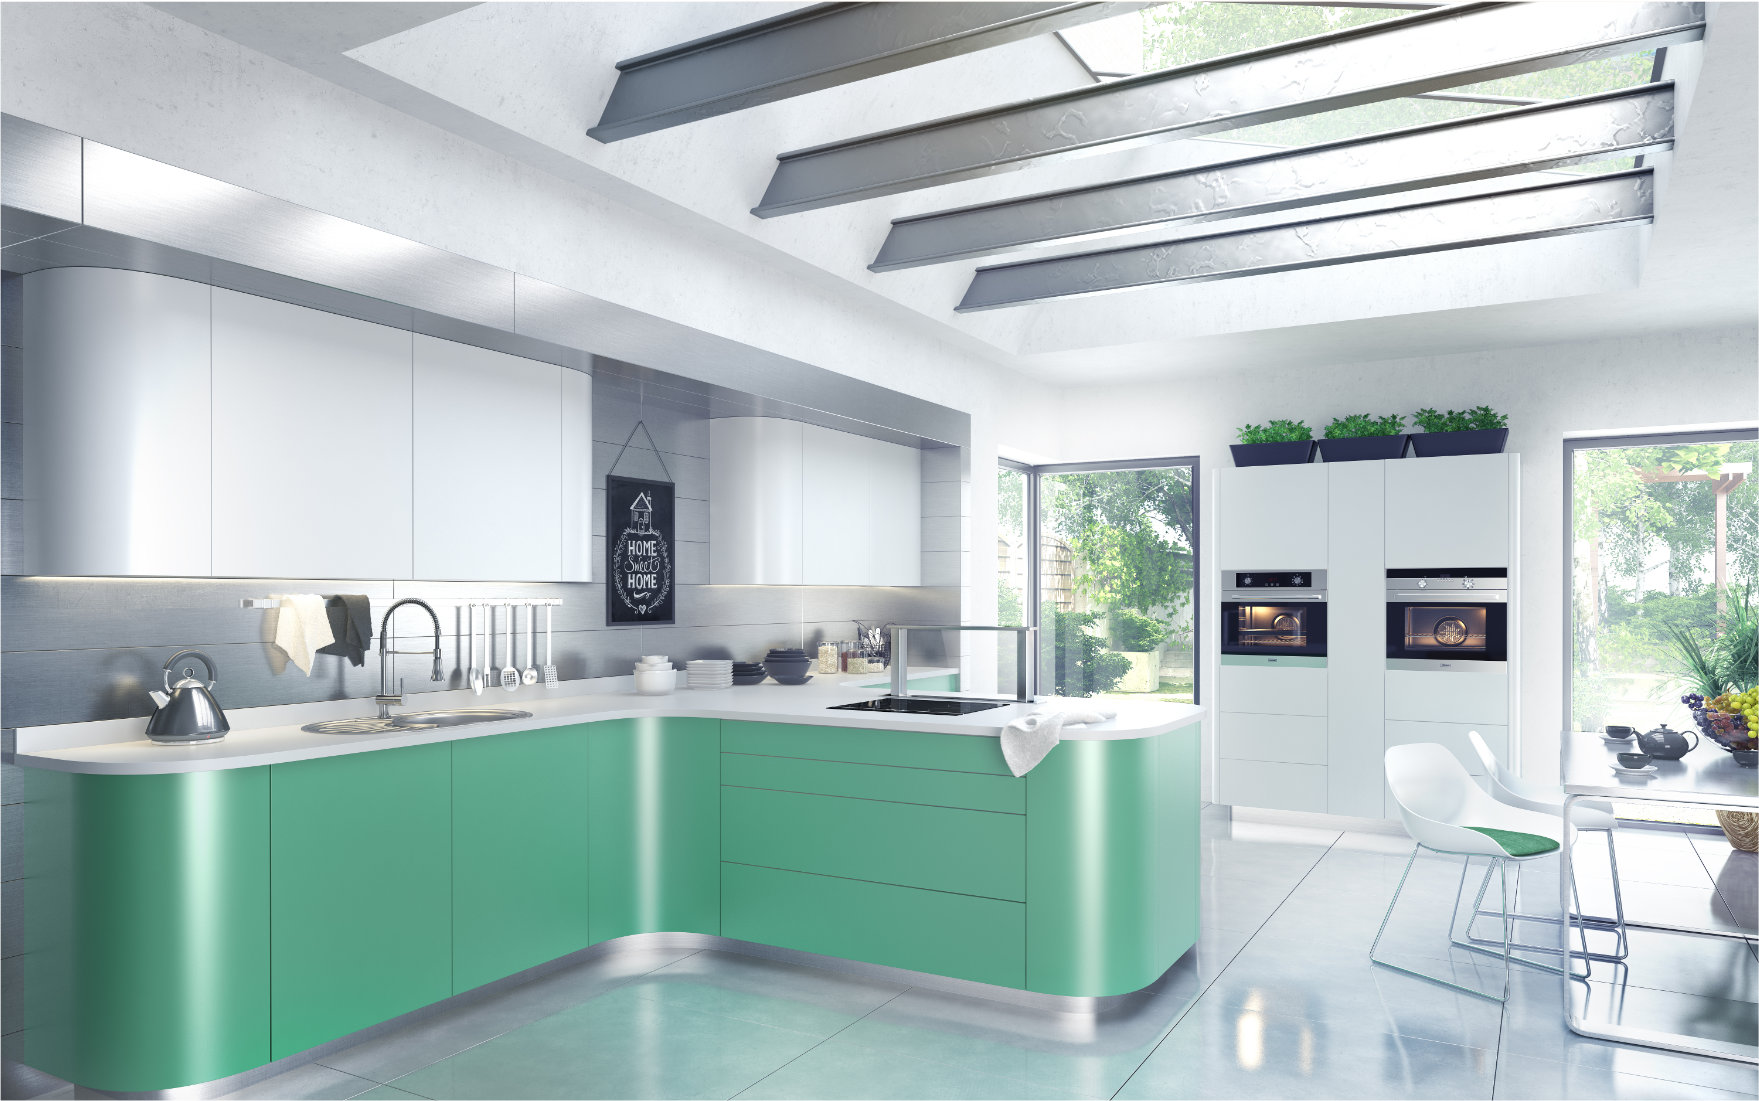 Wizualizacja 3D kuchni Hofemeier